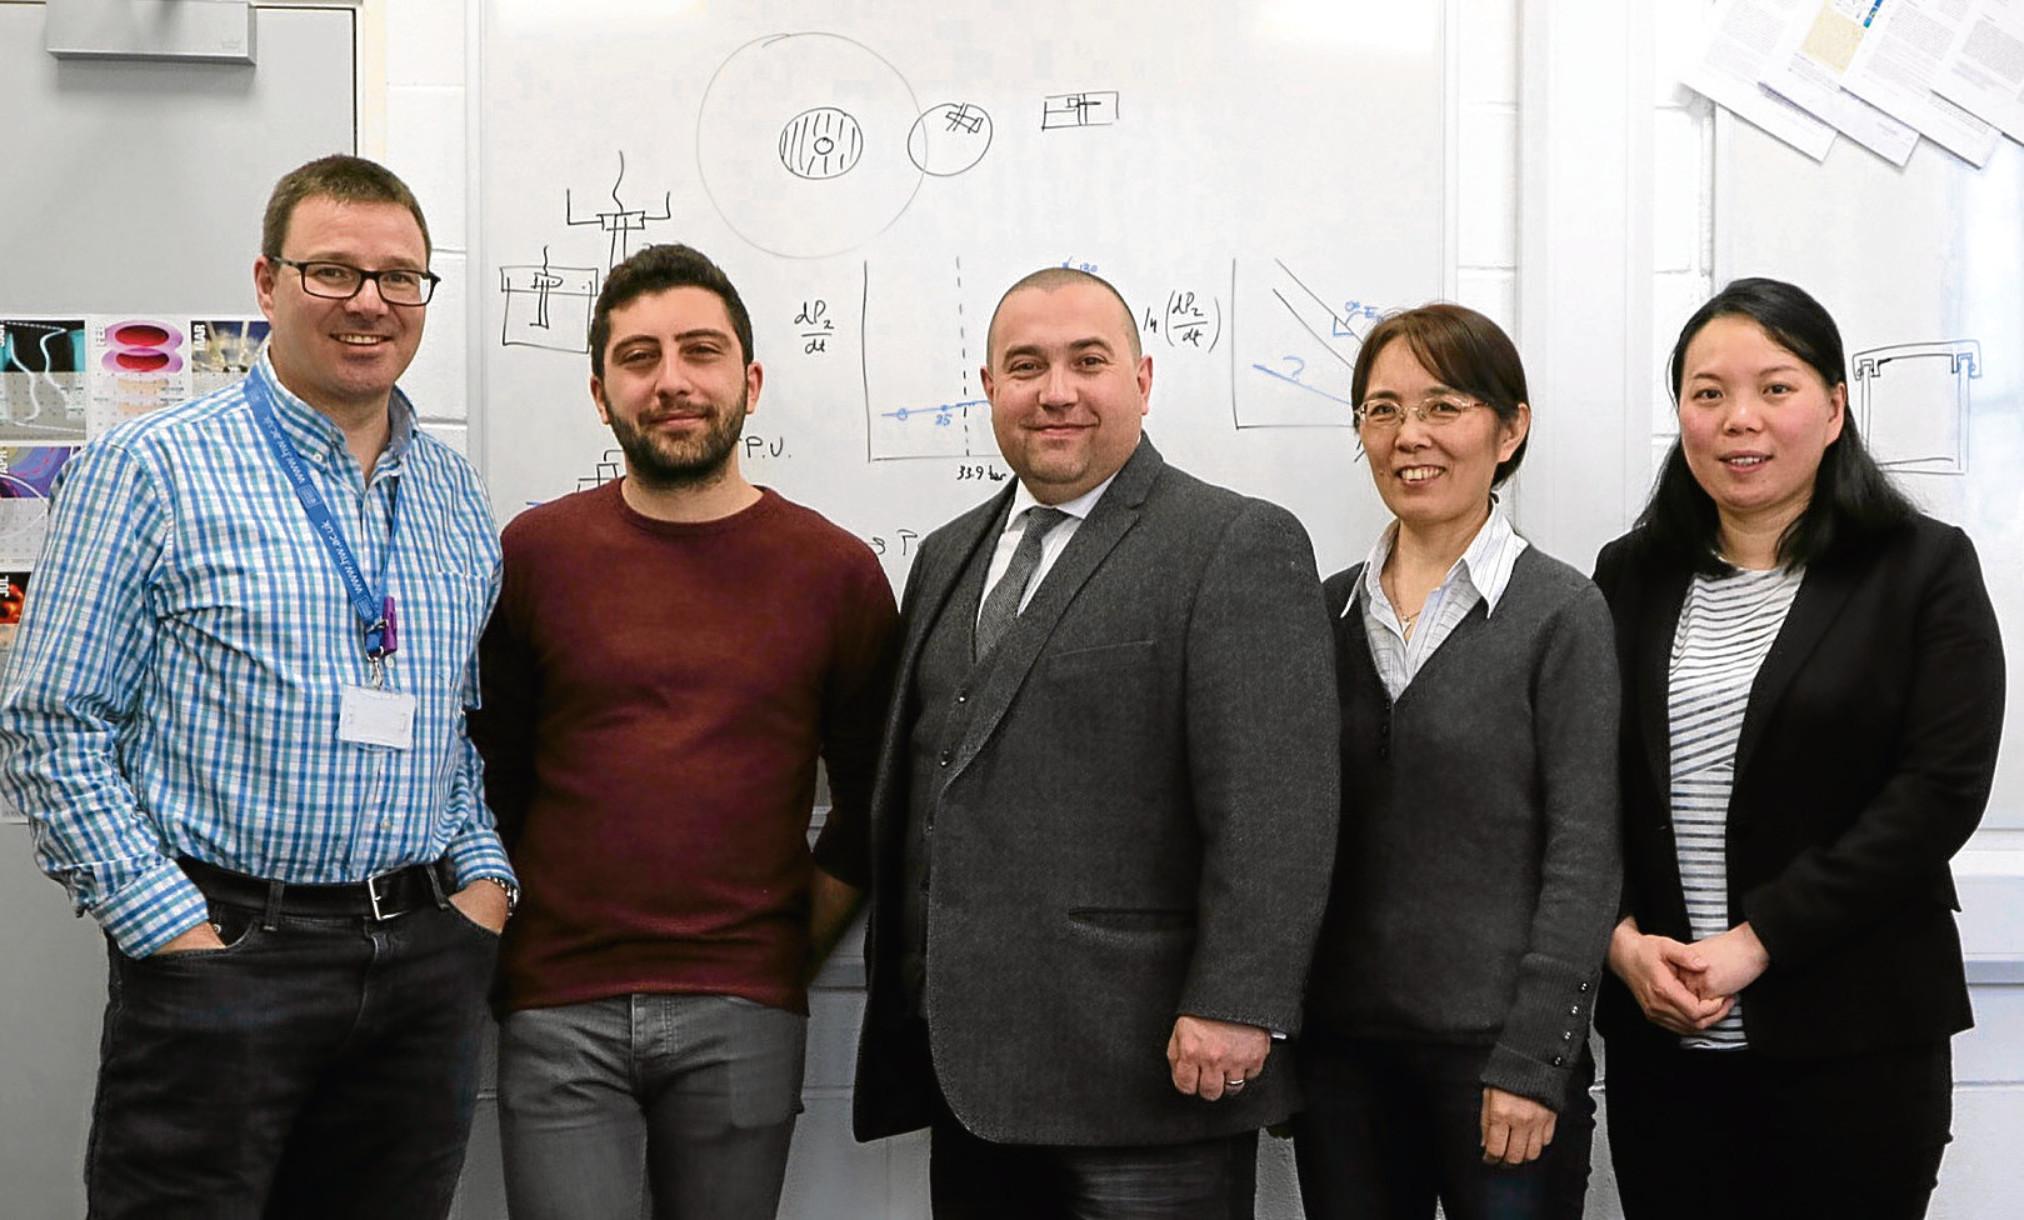 Professor David Bucknall, Luca Pellegrino, Professor Danmei Sun and Dr Meixuan Chen of Heriot Watt University  with Iron Ocean founder Simon Lamont (centre)